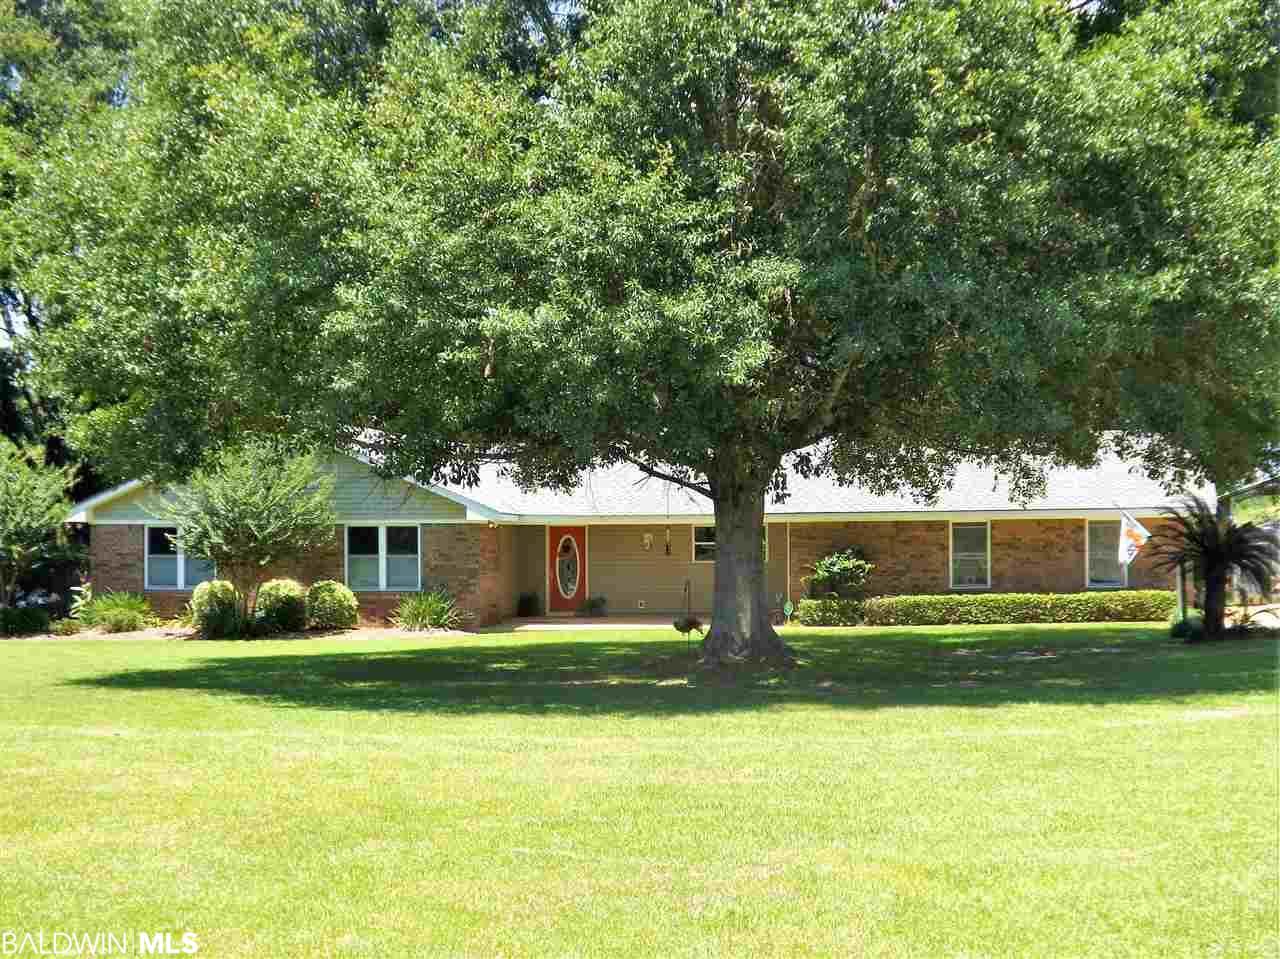 19855 County Road 62, Robertsdale, AL 36567